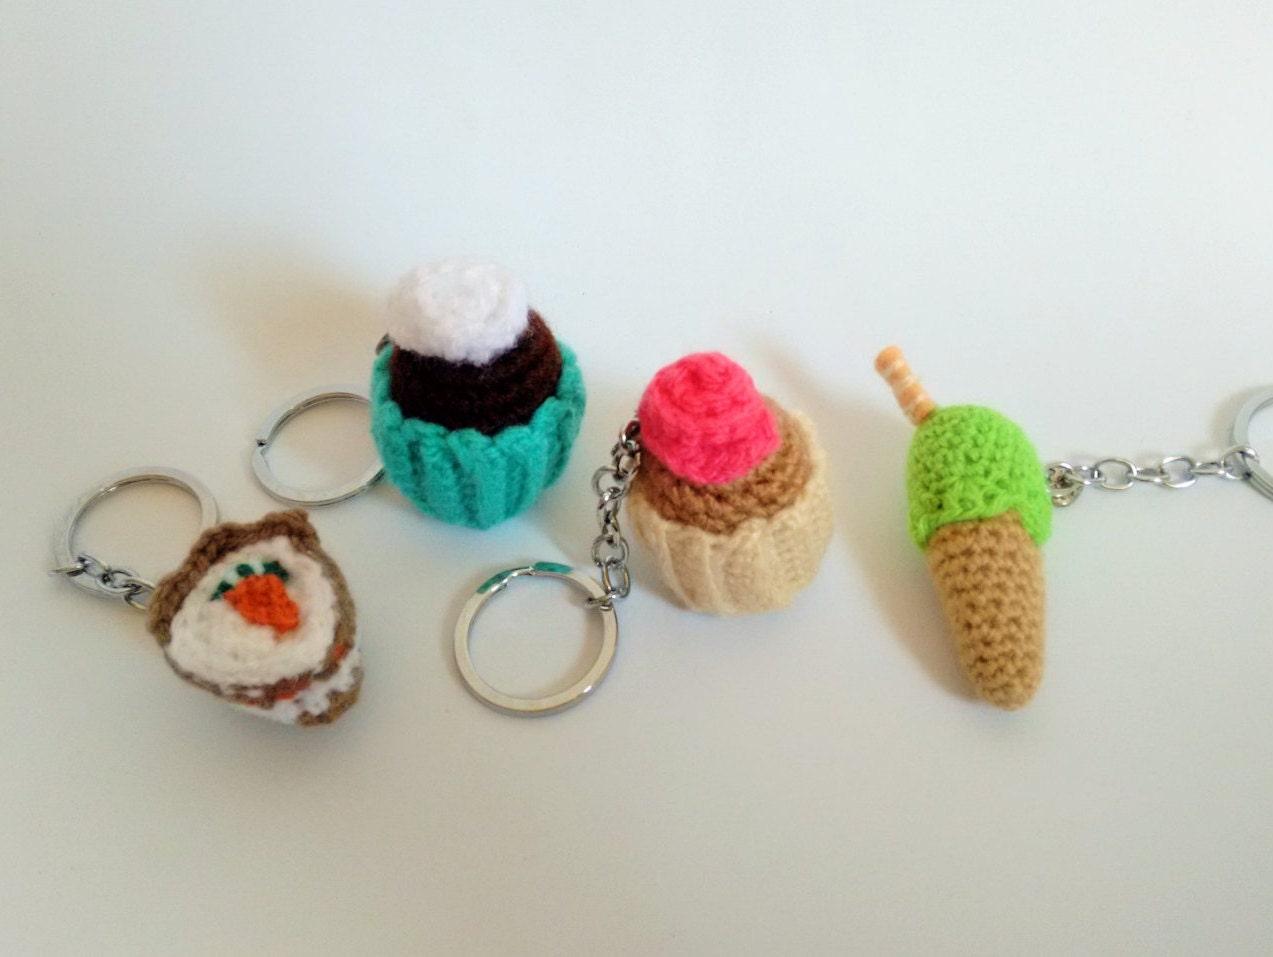 Amigurumi Cupcake Keychain : Amigurumi sweet keychain by Ganchilleandoypunto on Etsy